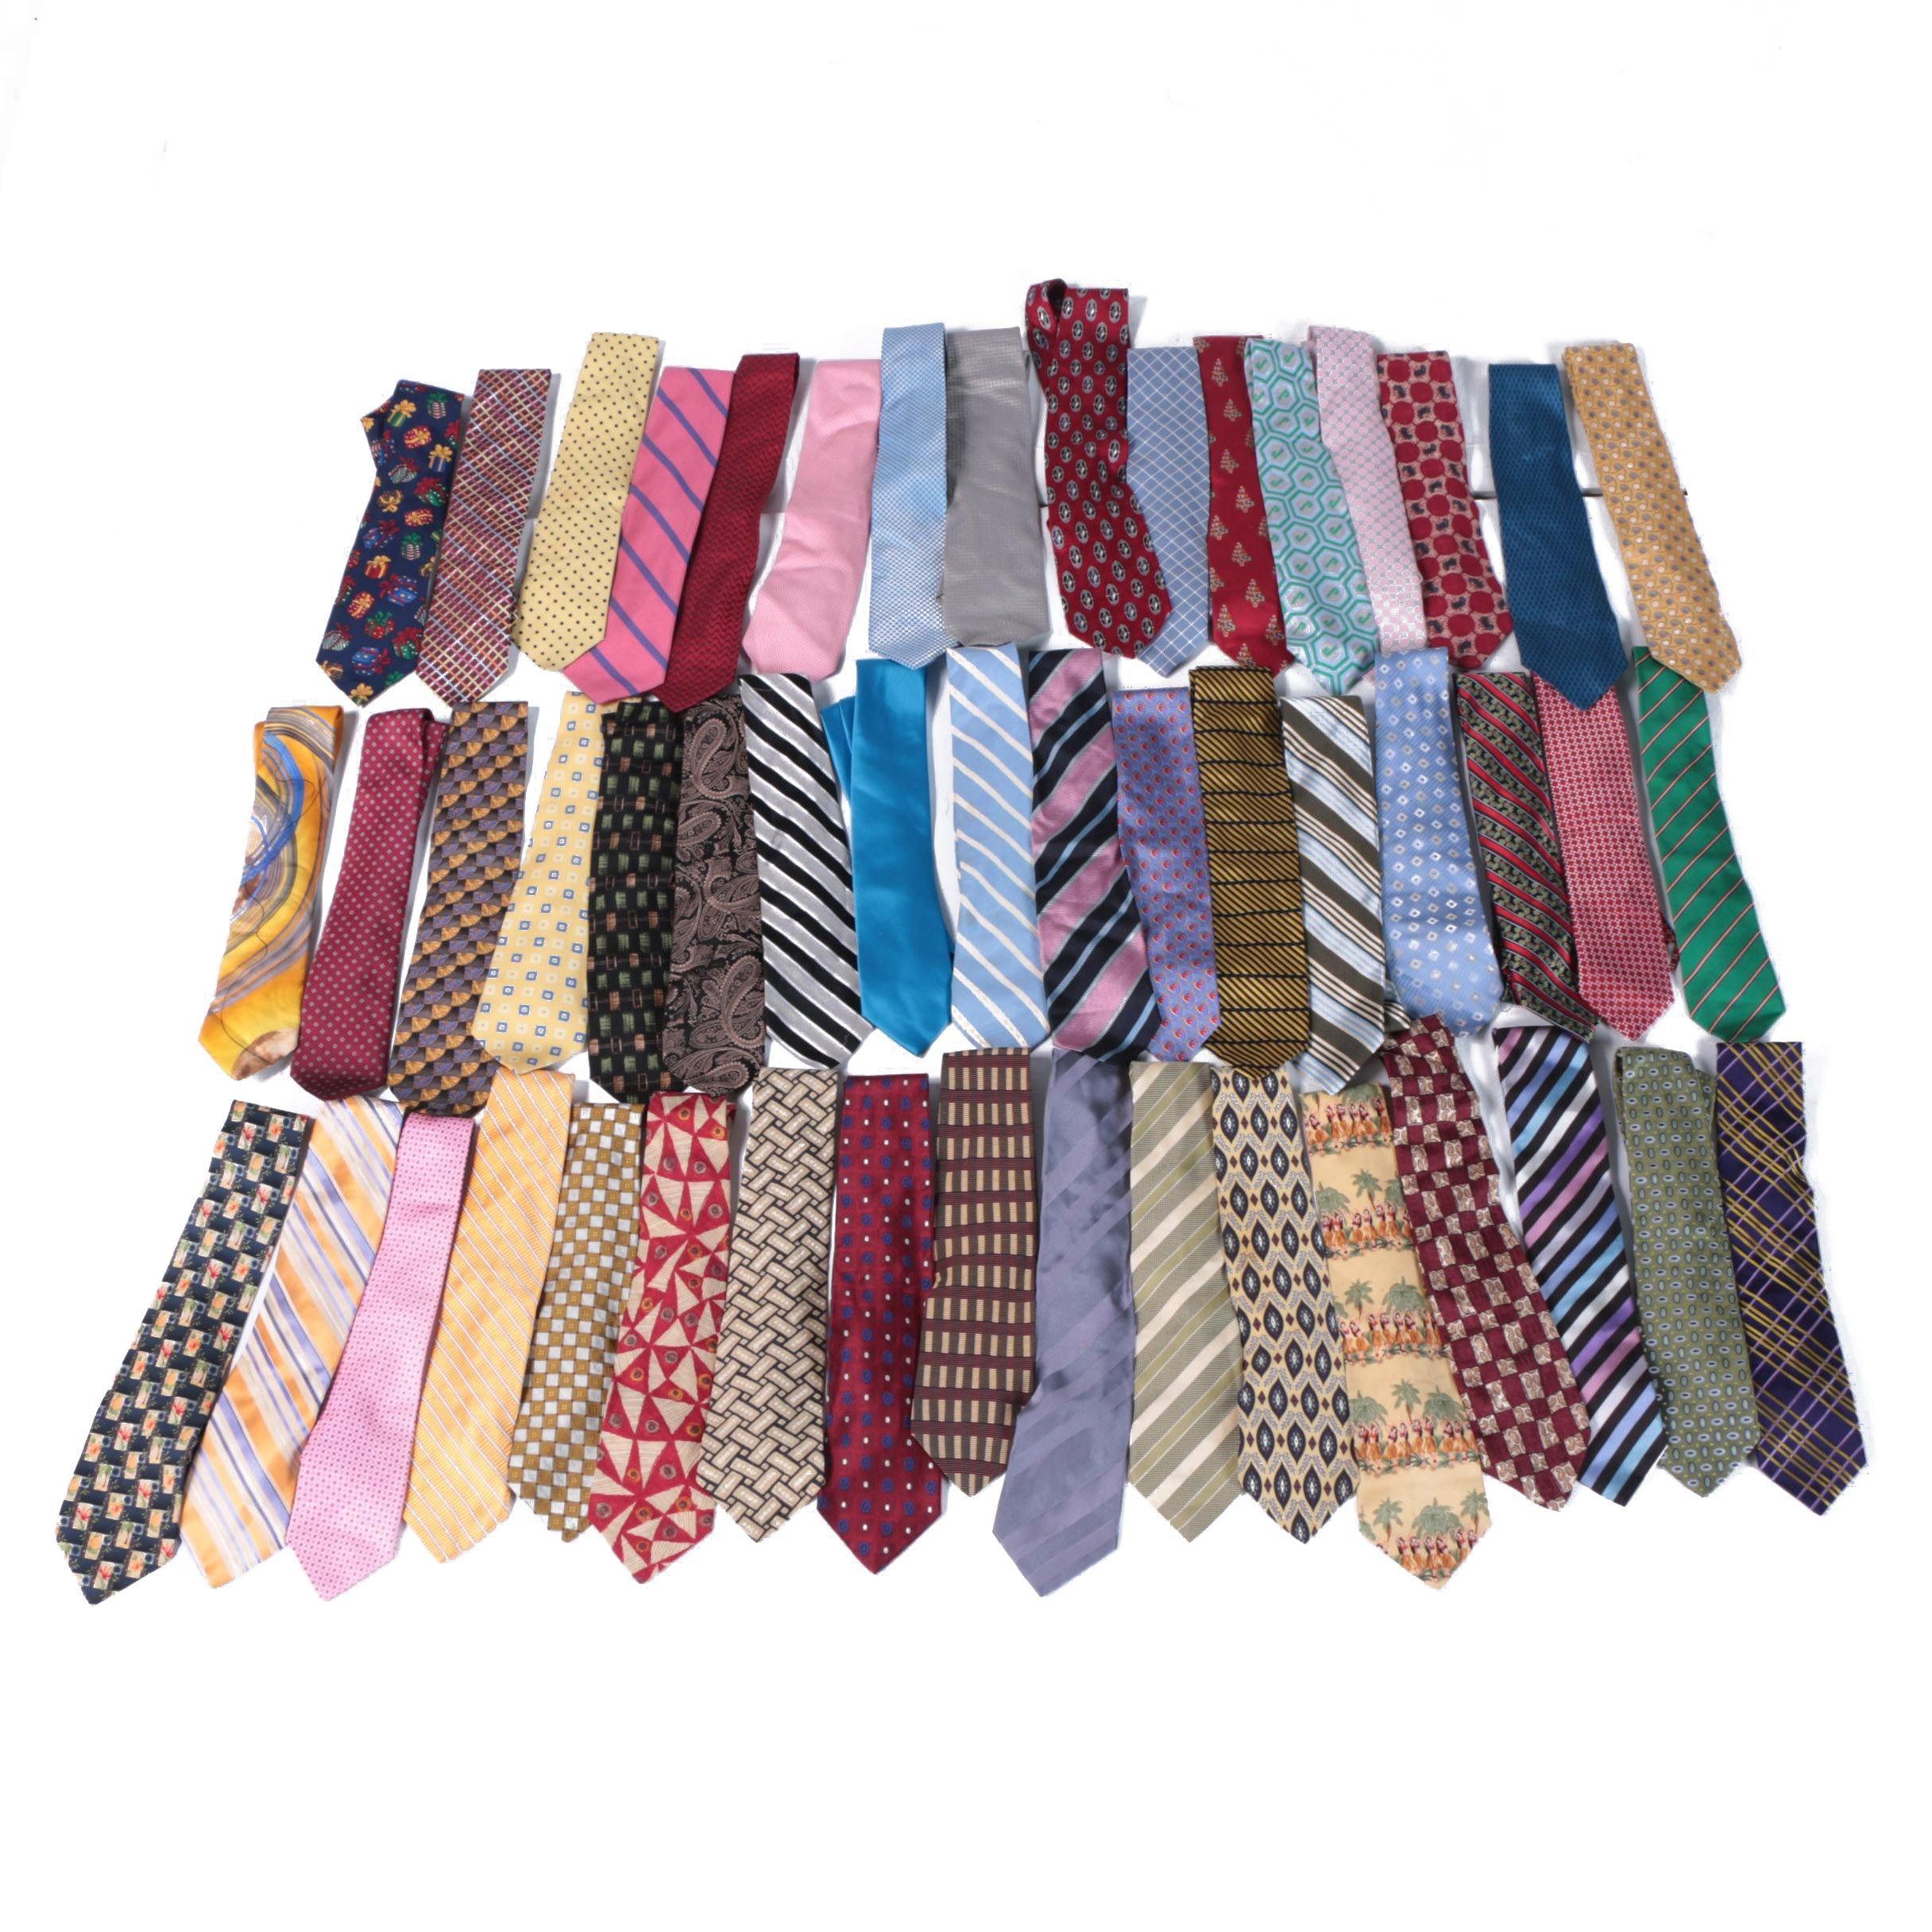 Men's Neckties featuring Geoffrey Beene, Nautica, Bugatti, and Ted Baker